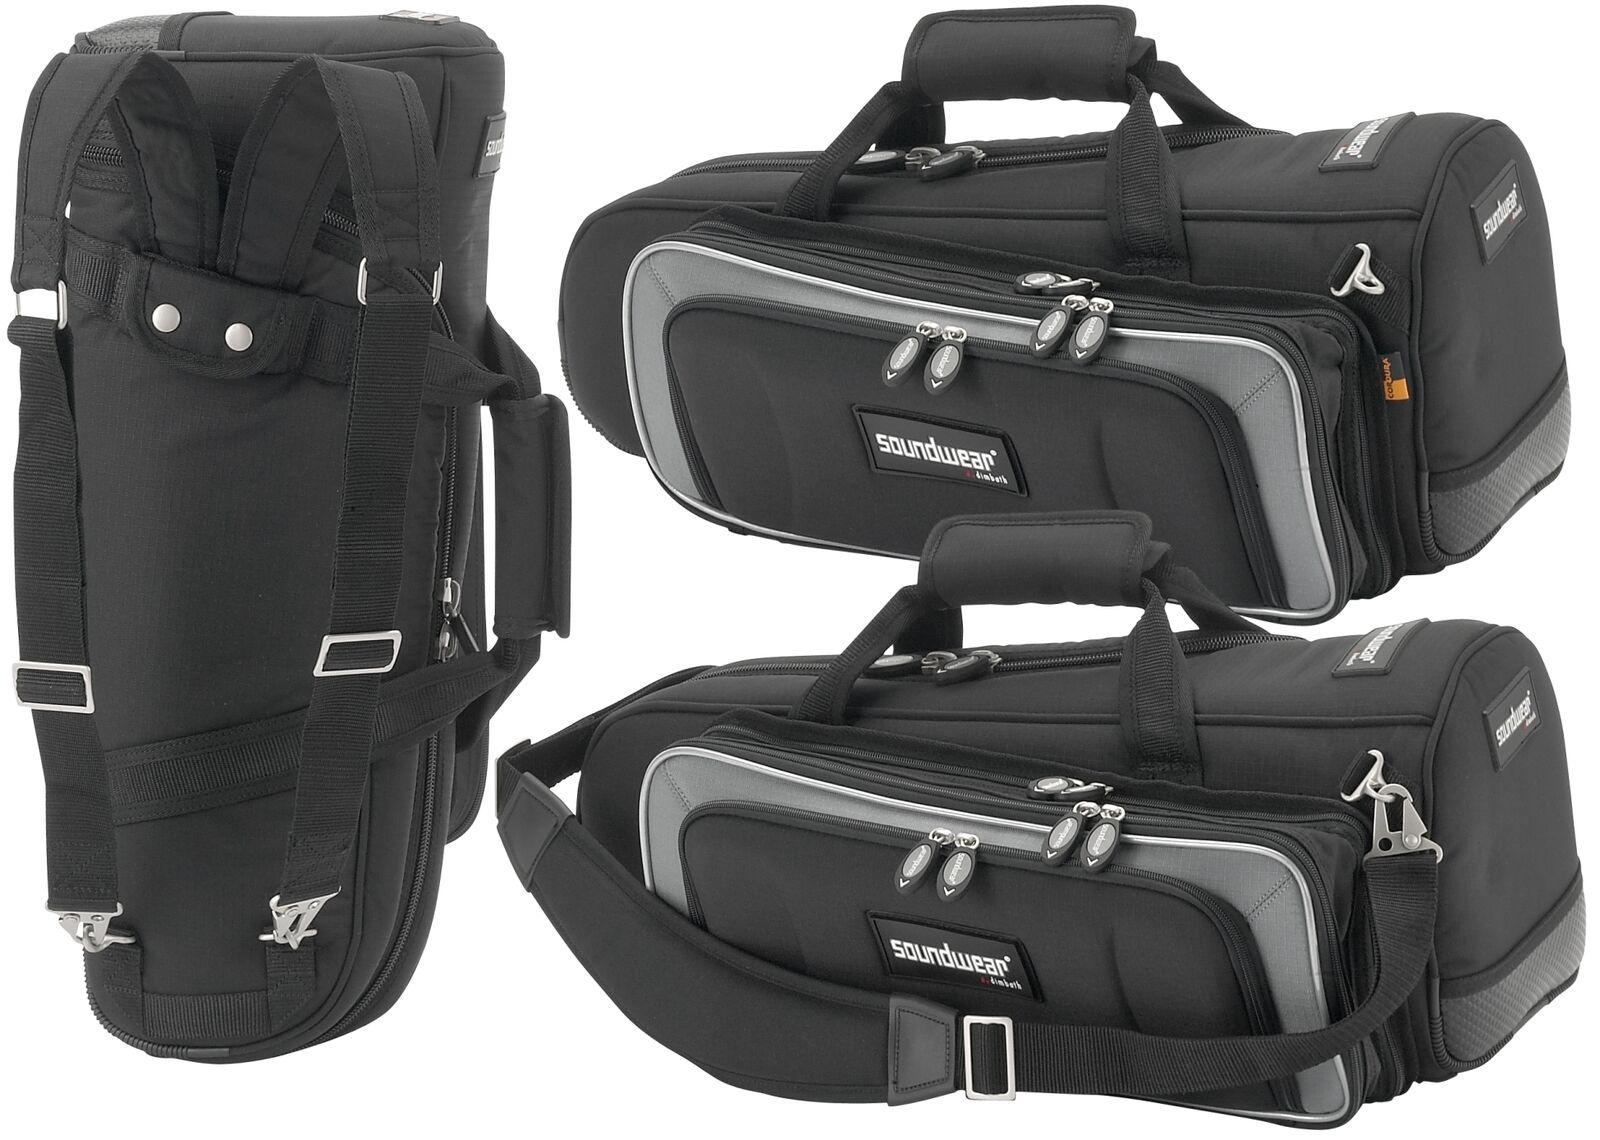 SOUNDWEAR FLÜGELHORN BAG TASCHE  Professional FHH  Bag for Flugelhorn